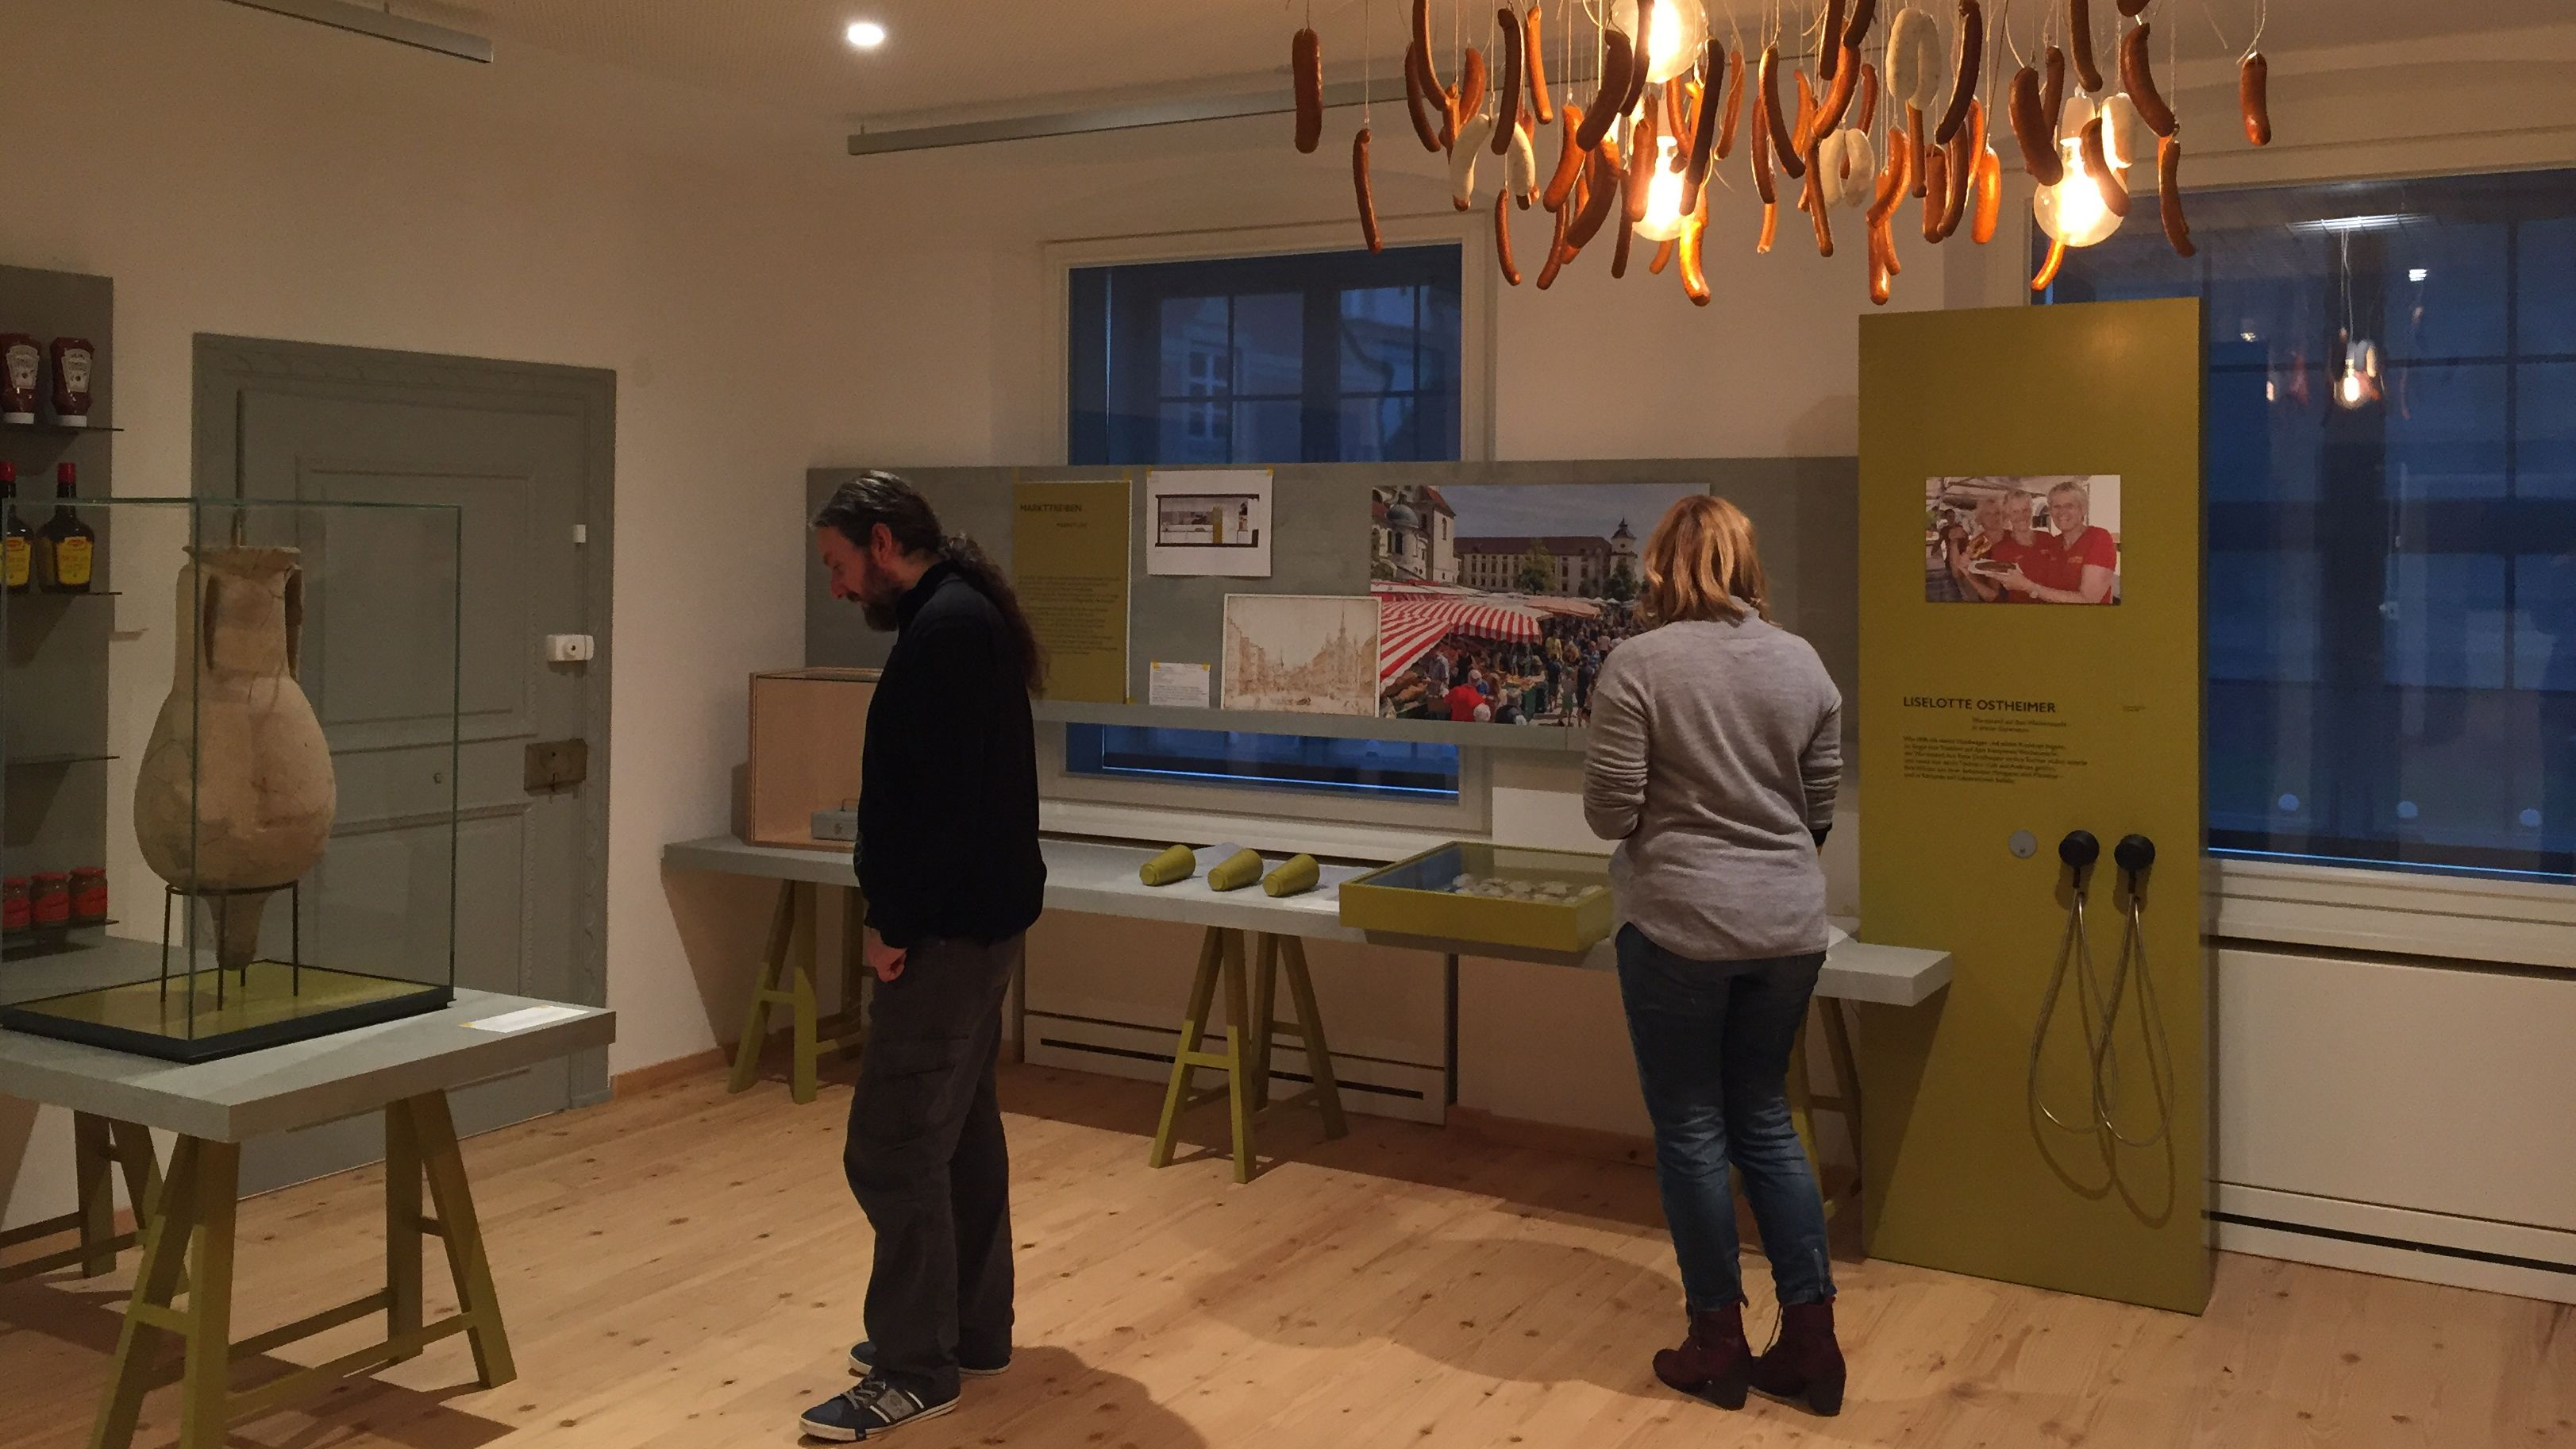 Besucher des Stadtmuseums in Kempten